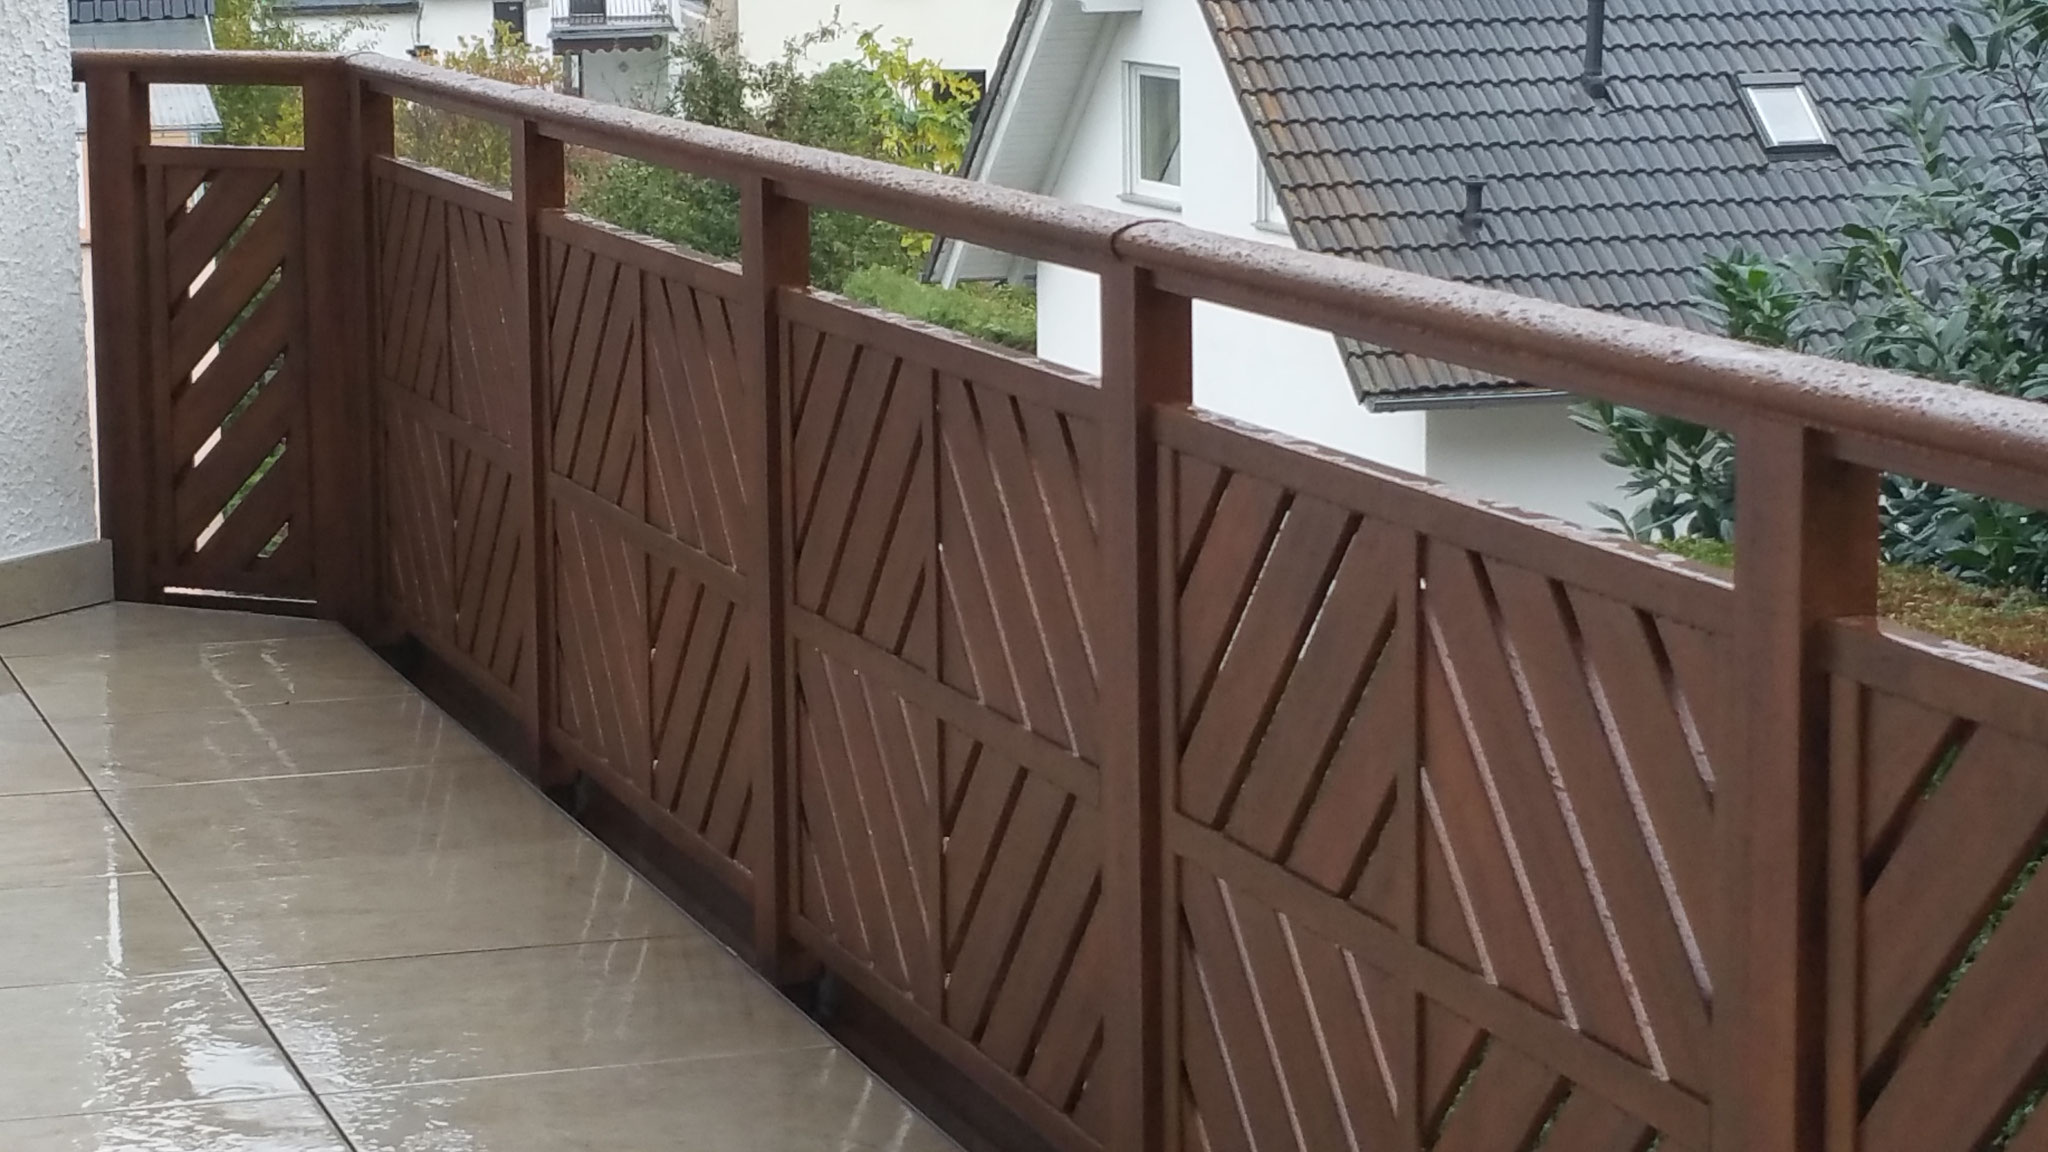 Alu Balkongeländer Kassel in Holzoptik